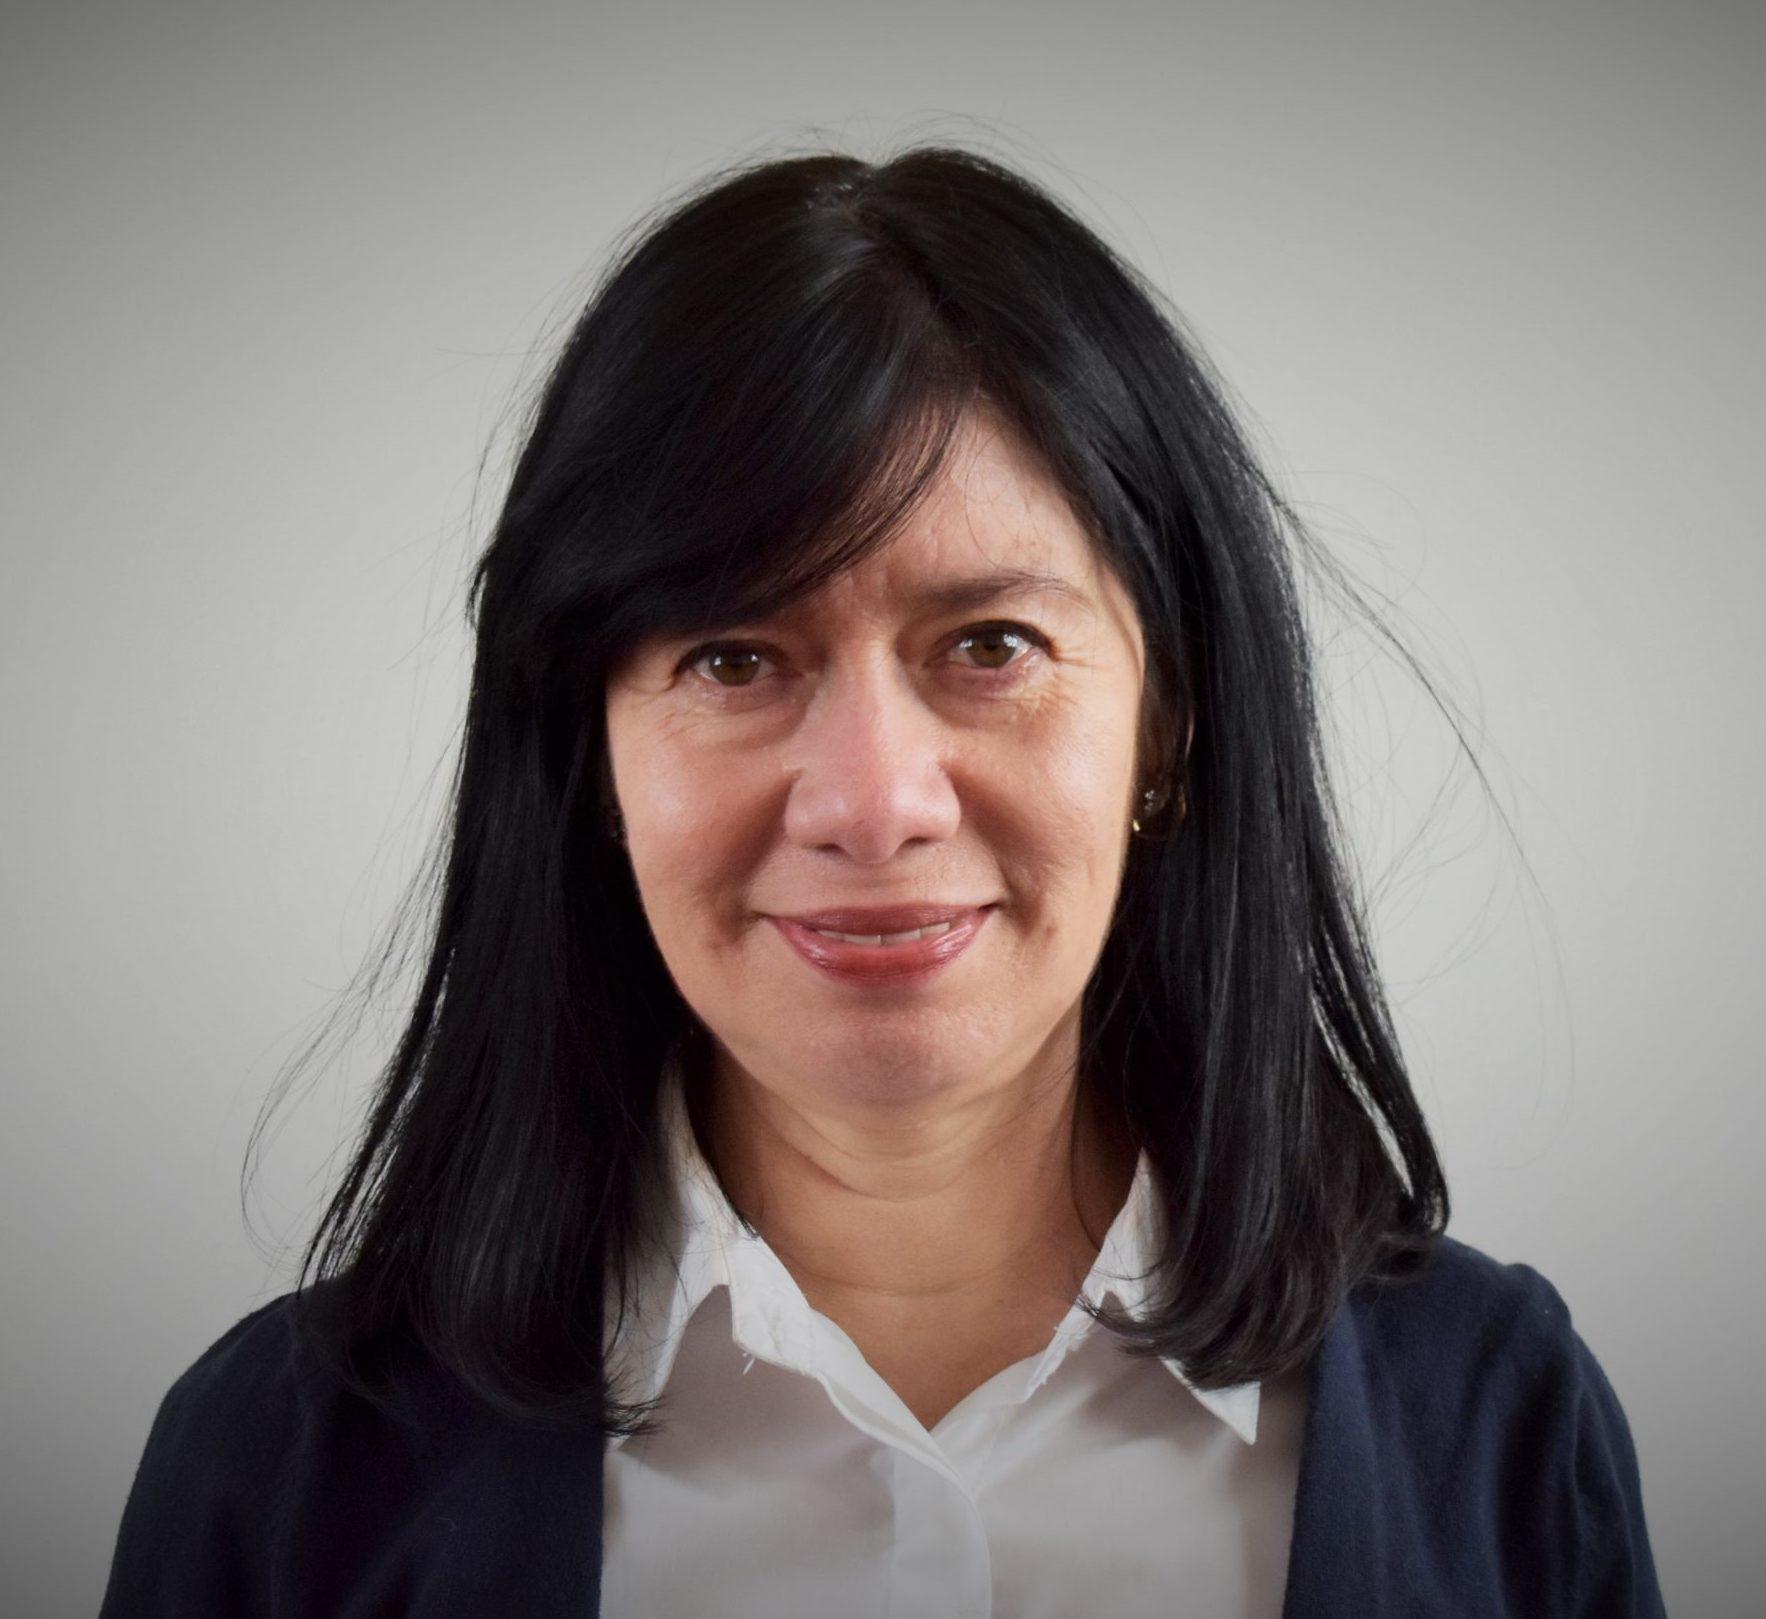 Paula Riquelme